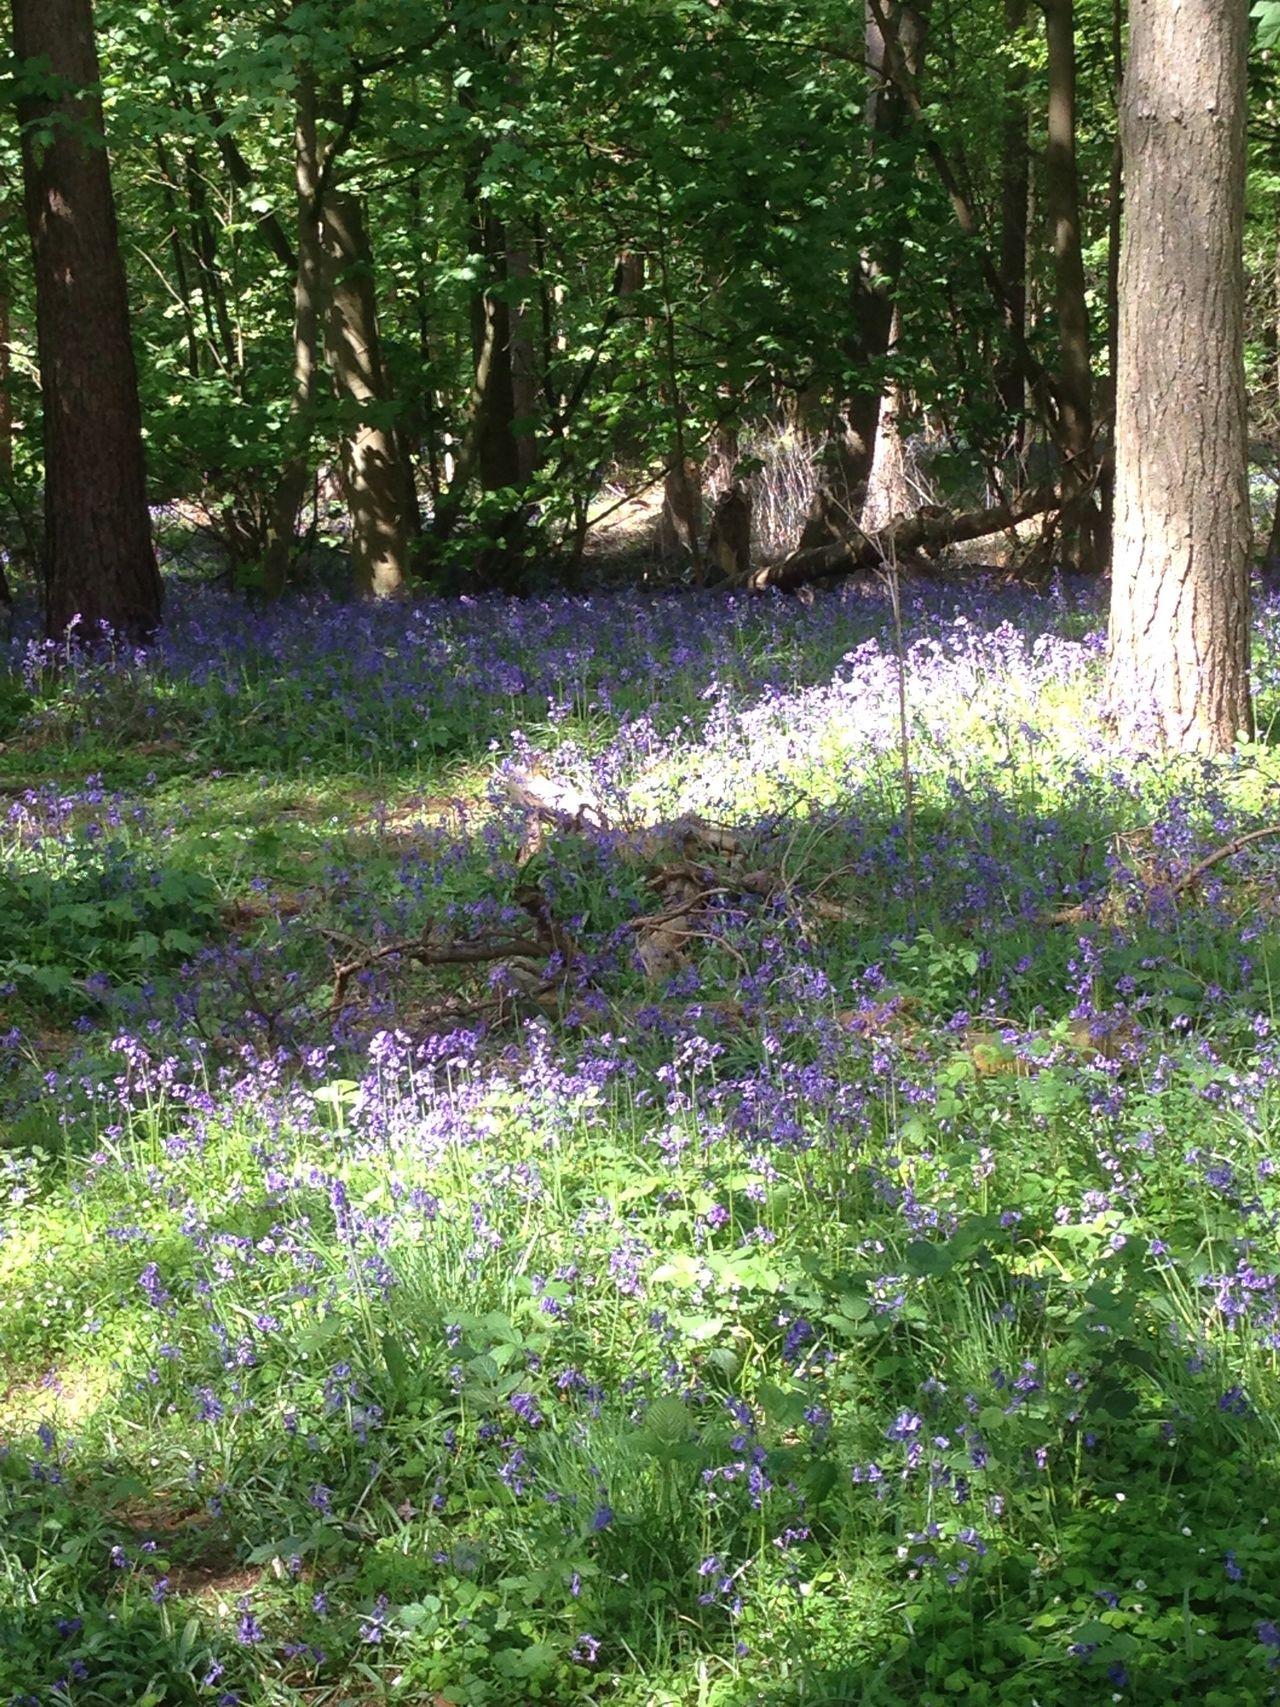 Bluebells Flowers Nature WoodLand The Great Outdoors - 2017 EyeEm Awards